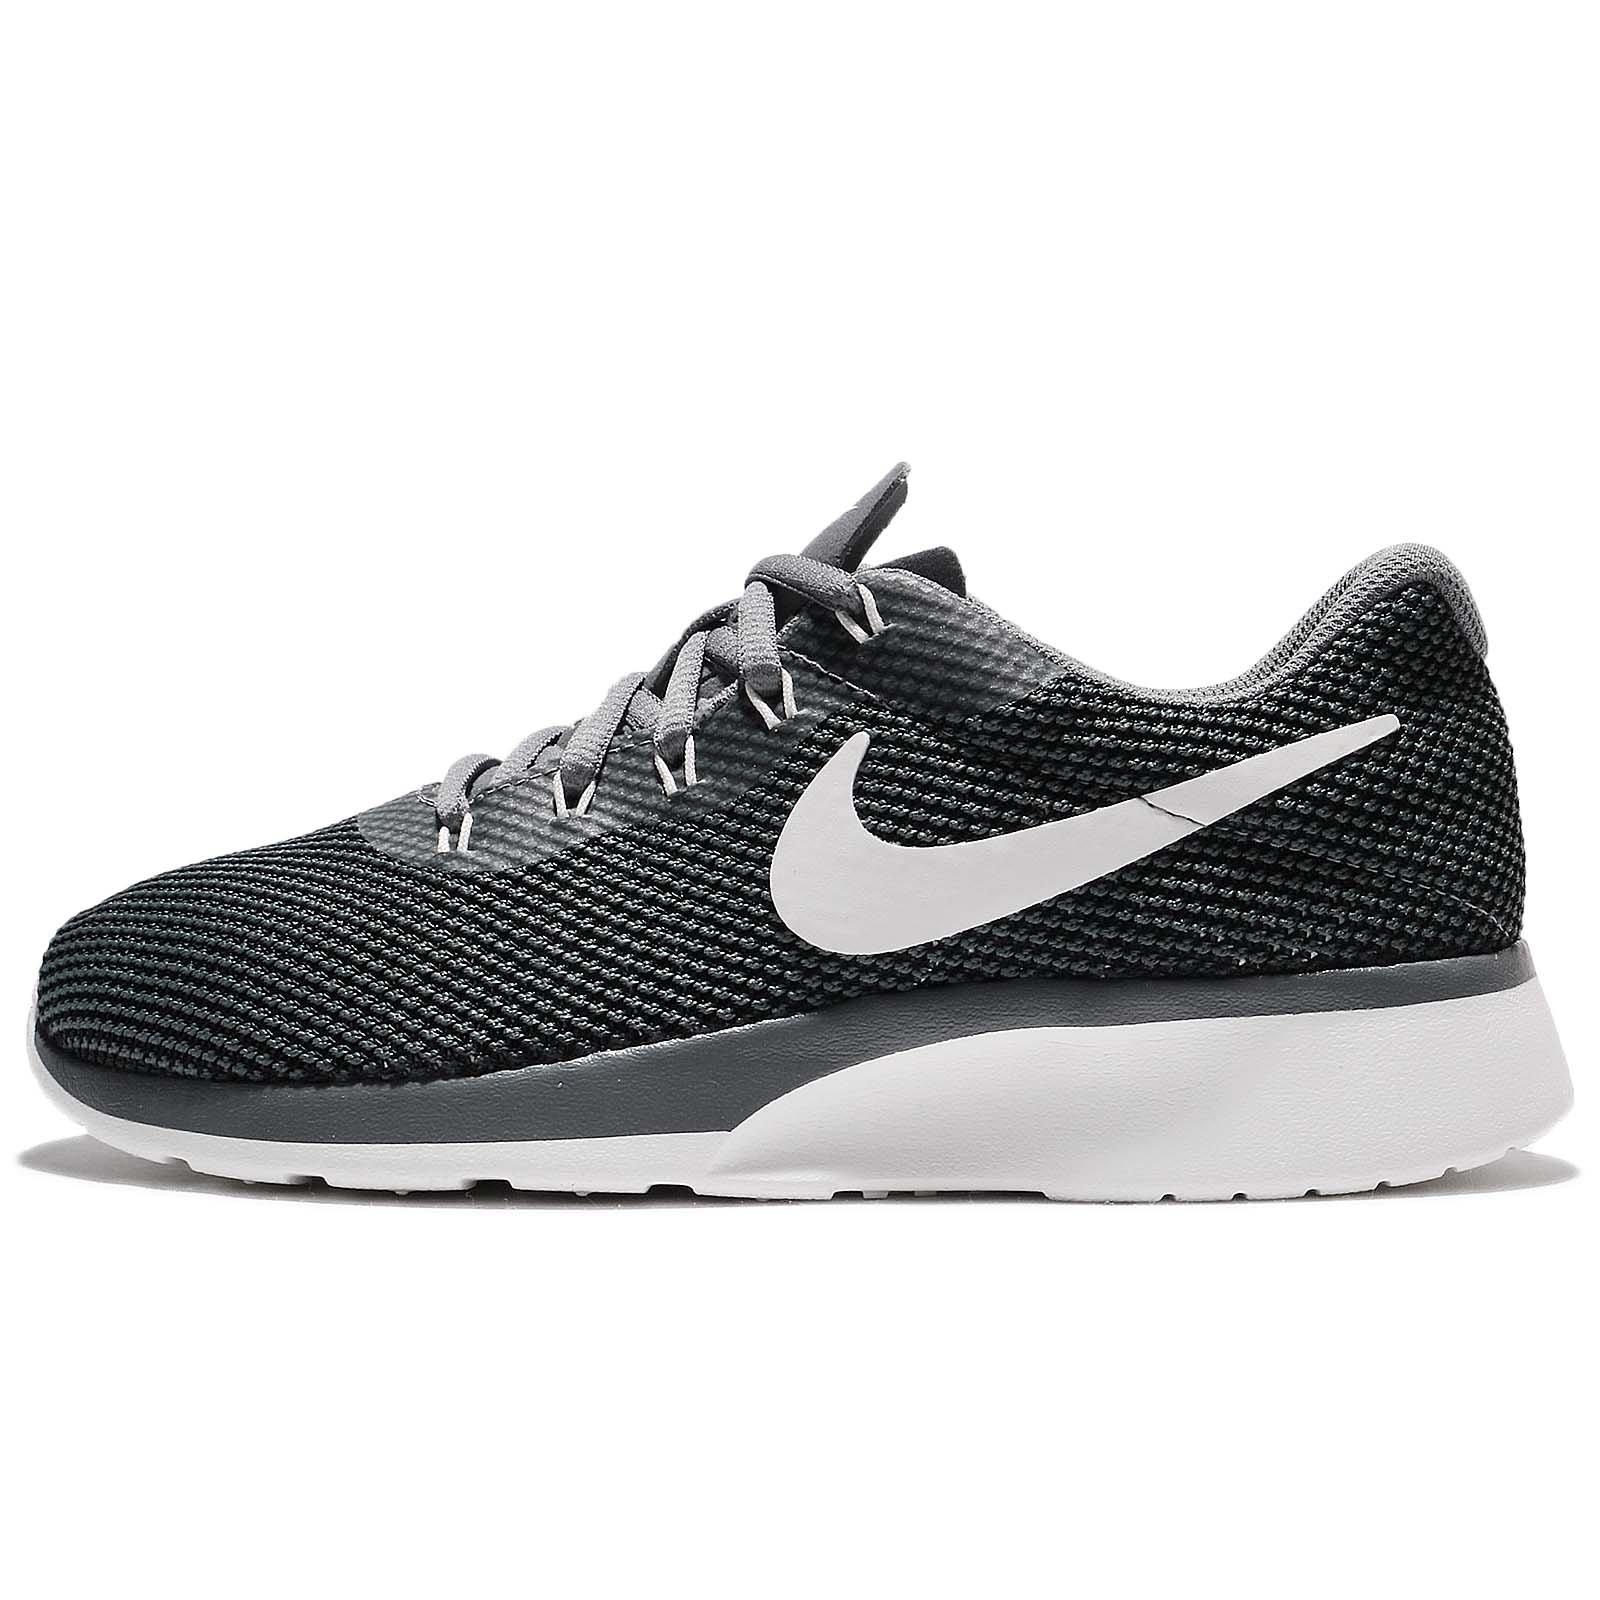 e30e1e2c456 Galleon - Nike Womens WMNS Tanjun Racer Cool Grey SAIL Black Size 11